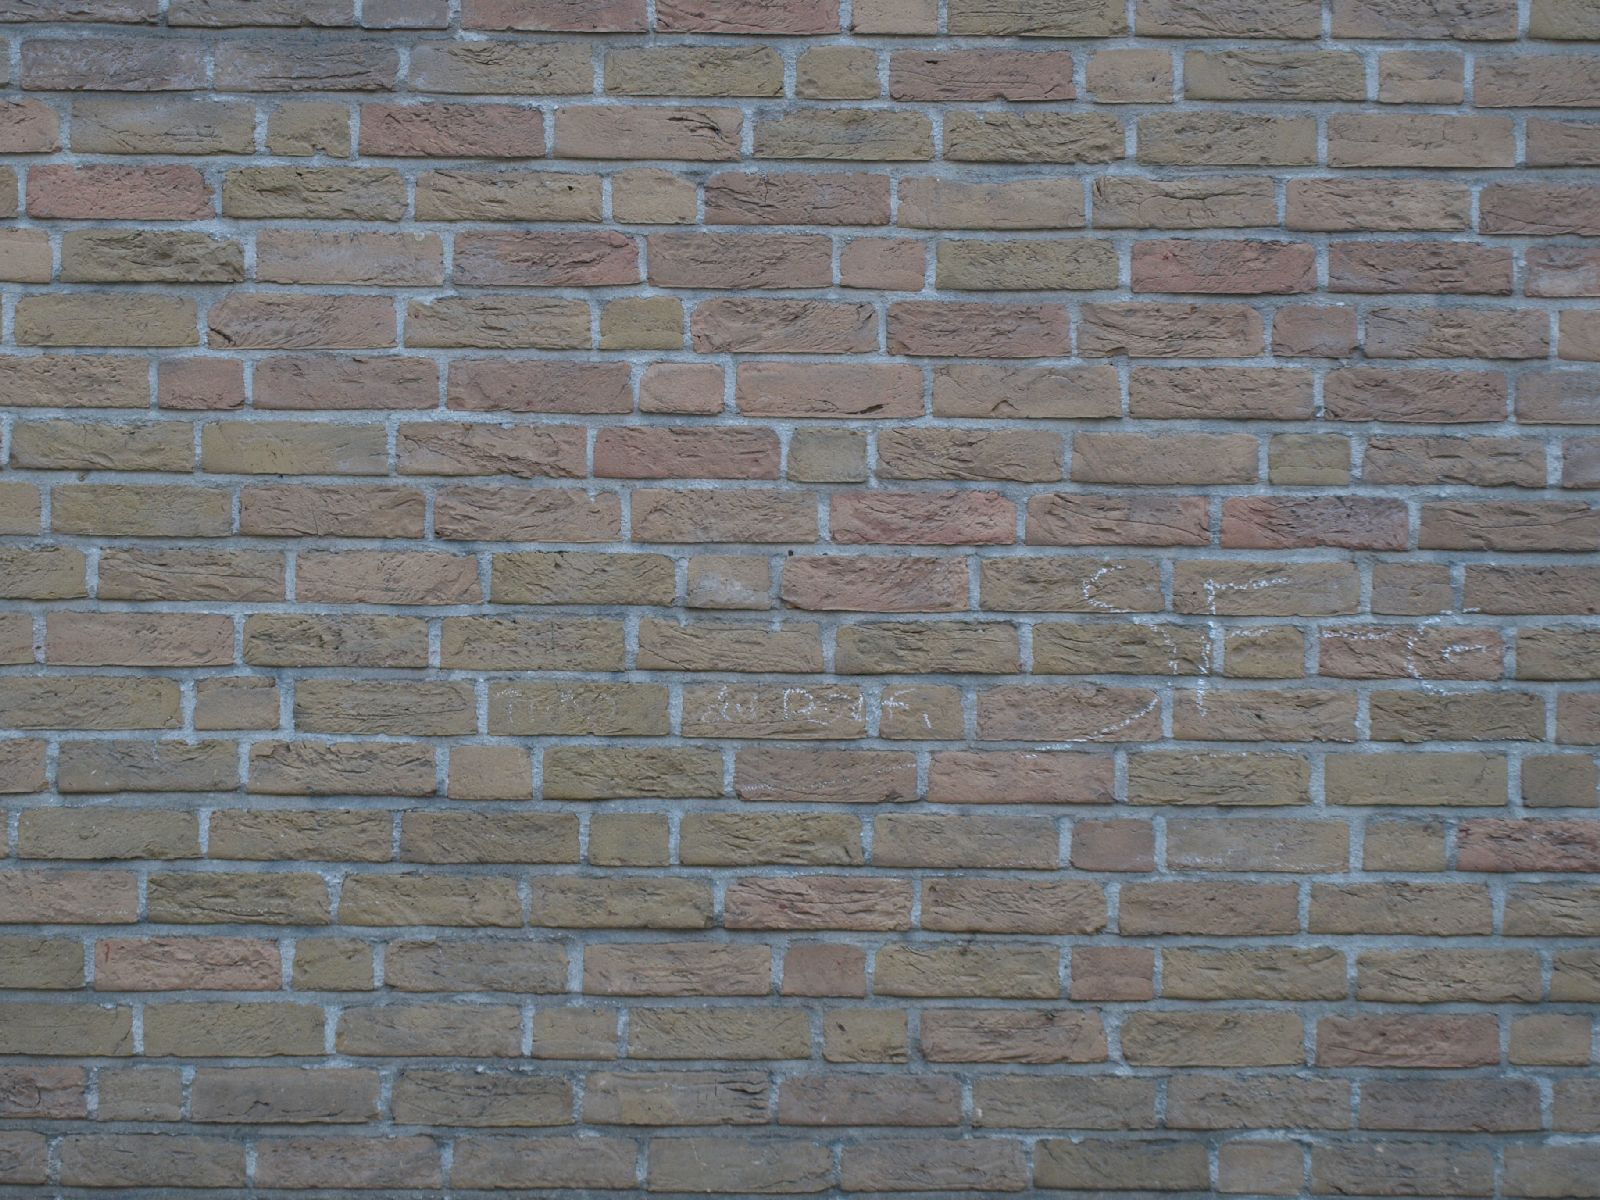 Wand-Mauerwerk-Backstein_Textur_A_P1209550